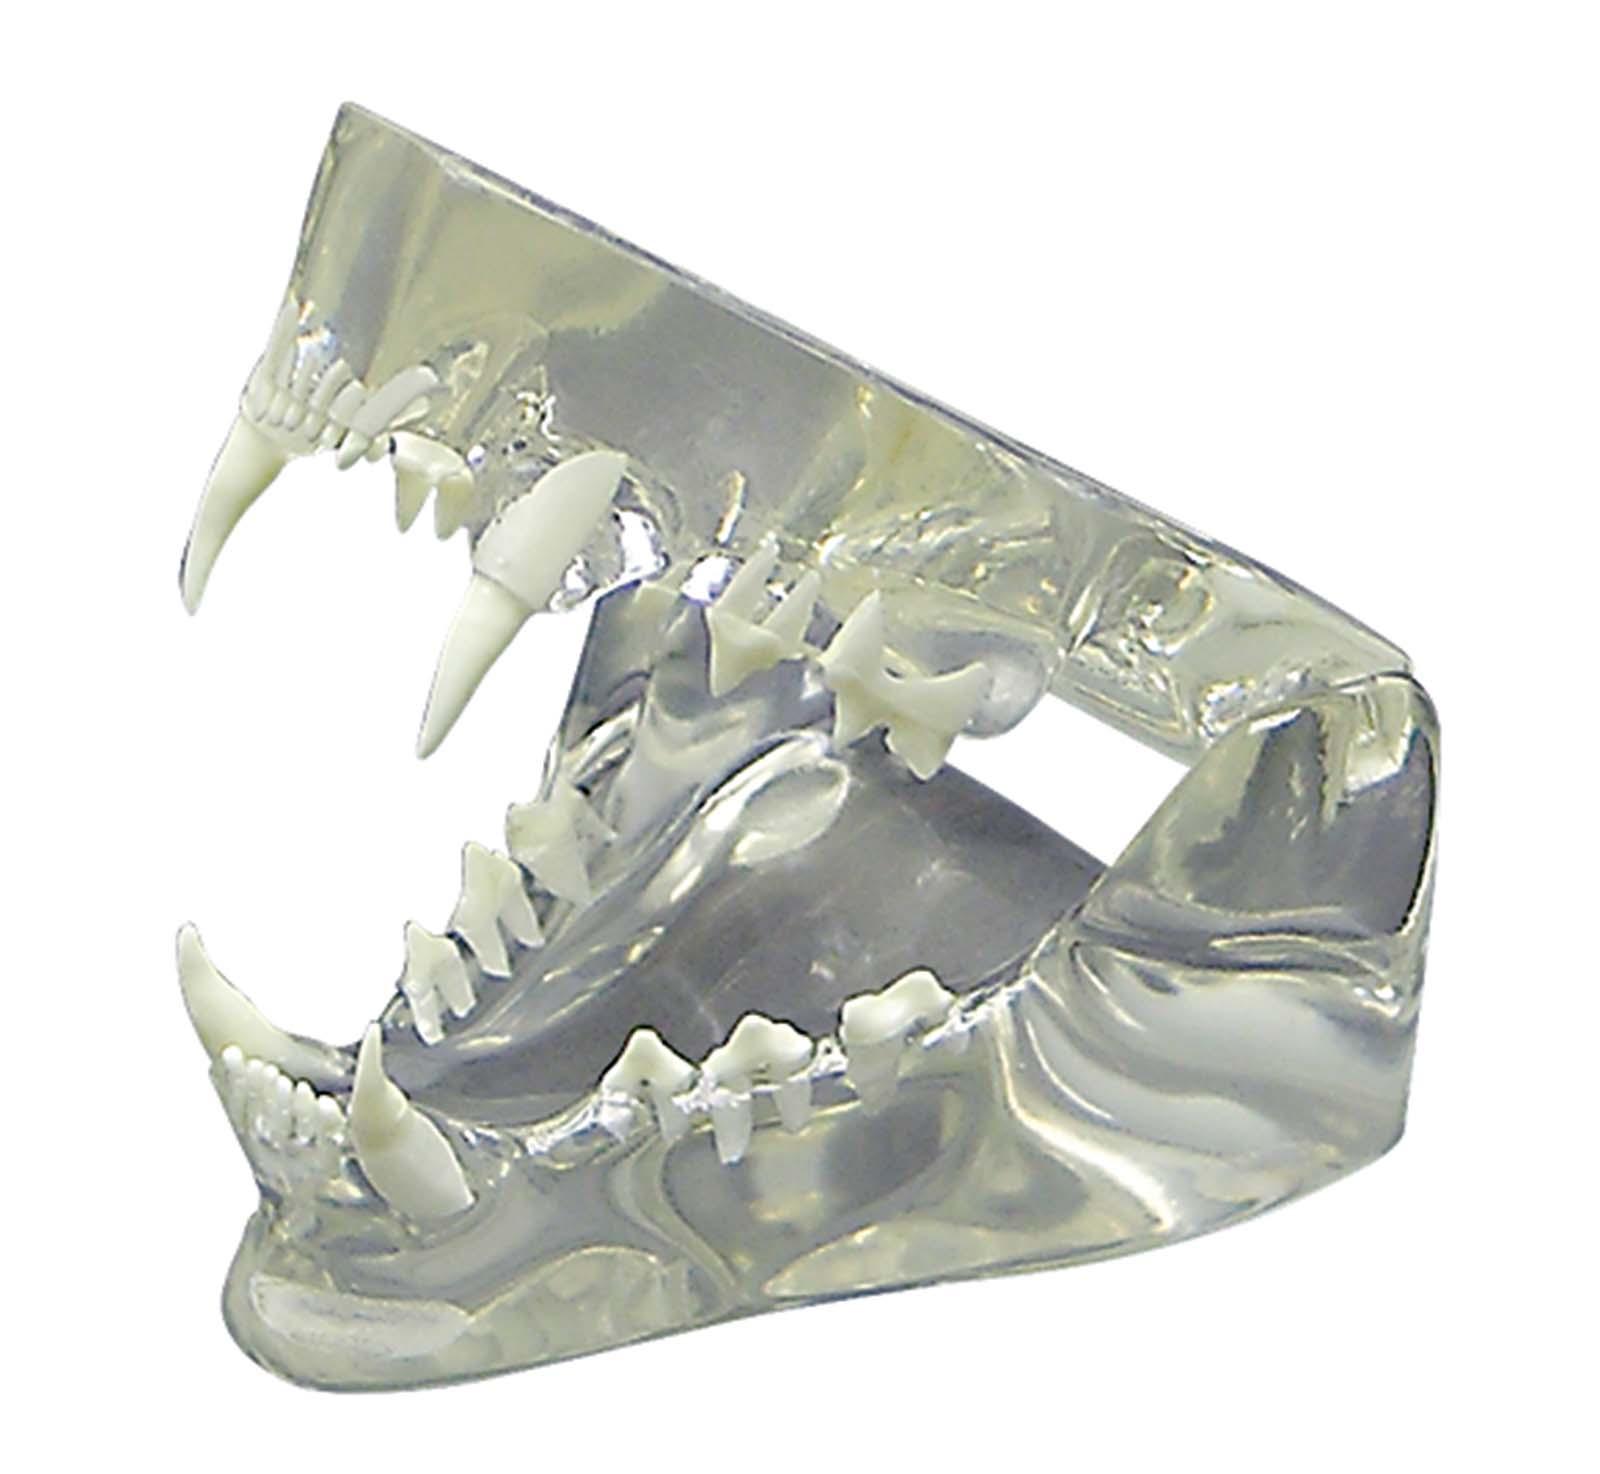 Feline Jaw Anatomical Model Clear With Teeth